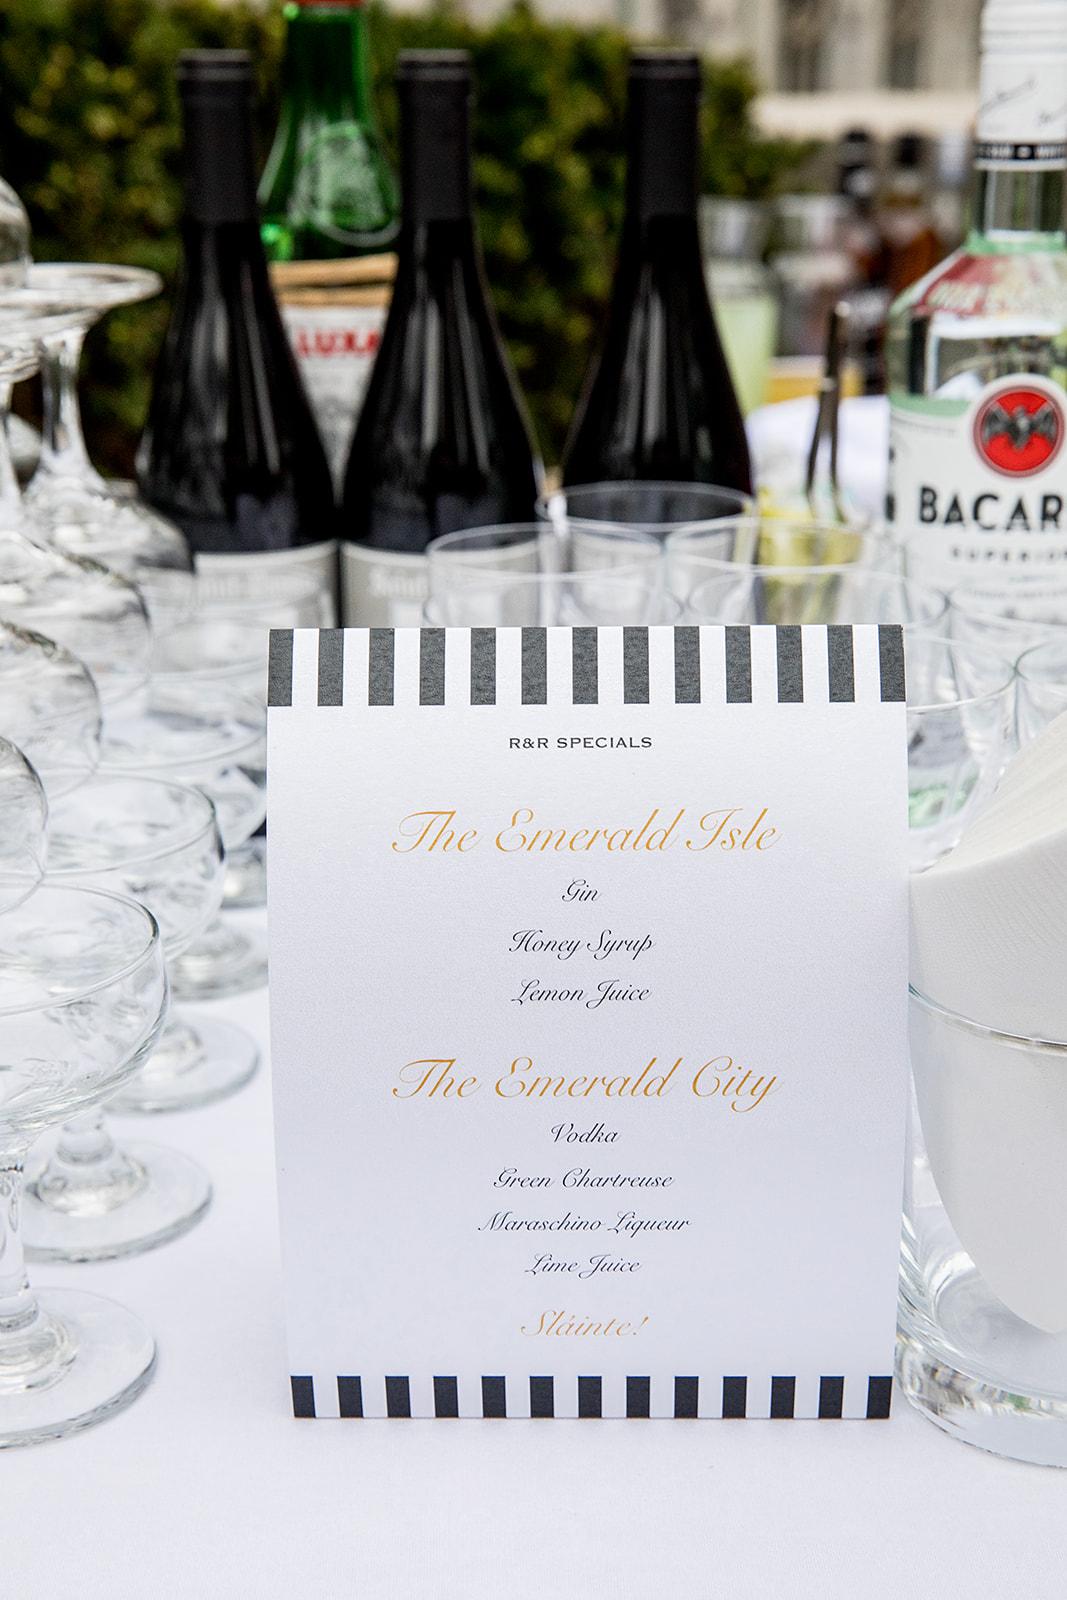 Wedding Specialty Drinks